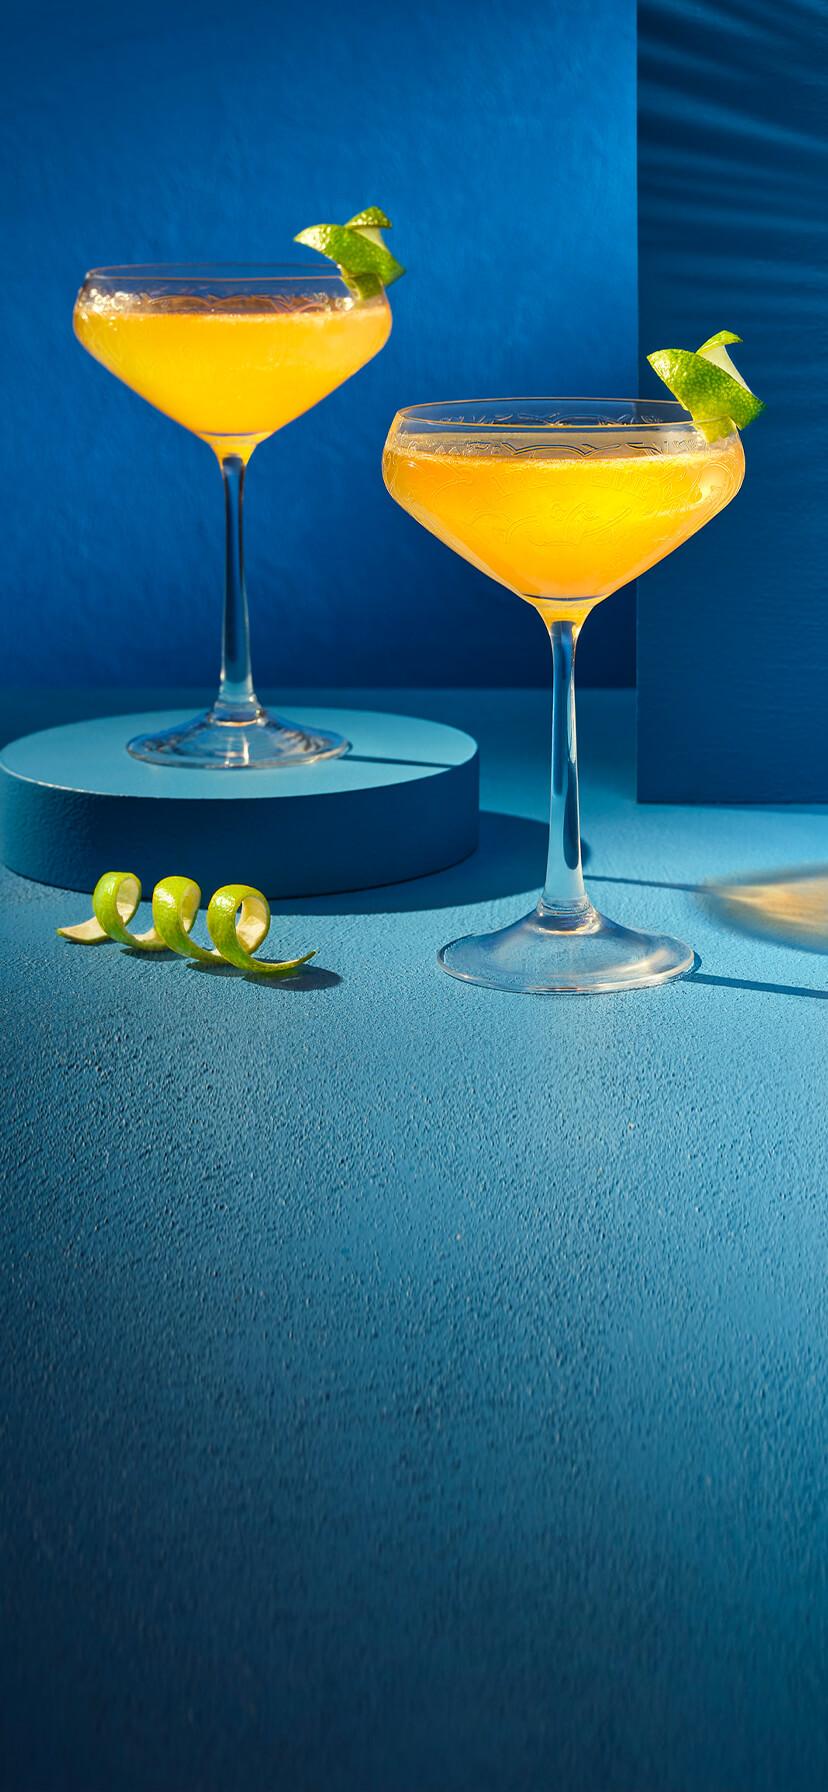 Discover Jamaican Daiquiri Cocktail